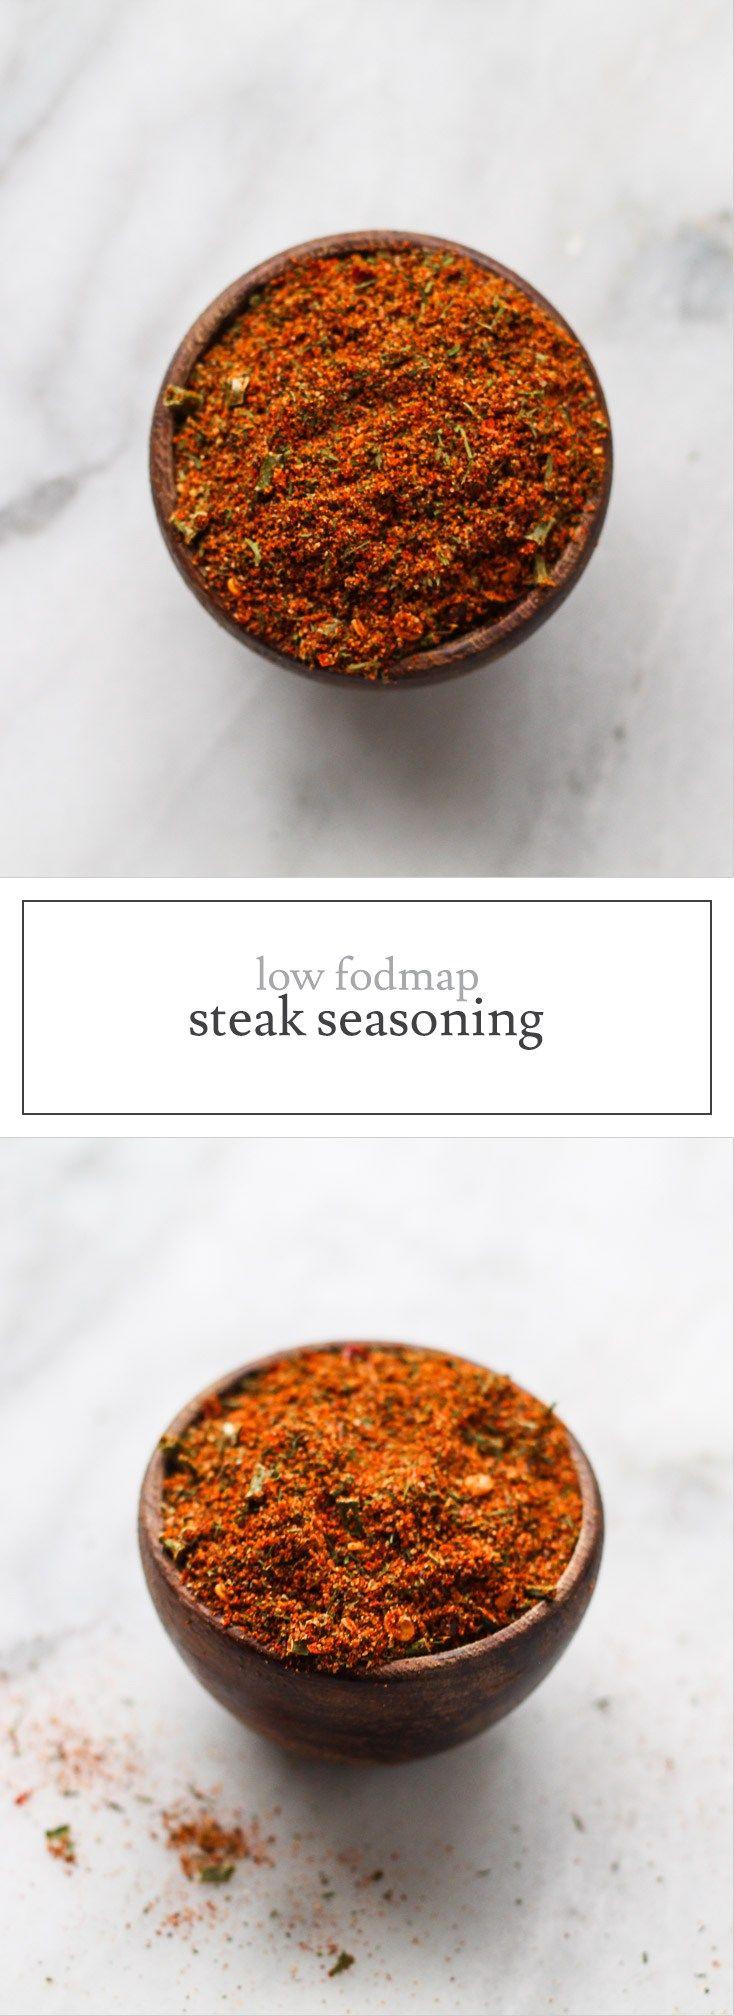 Hf ideas parrillas y asados - Low Fodmap Steak Seasoning